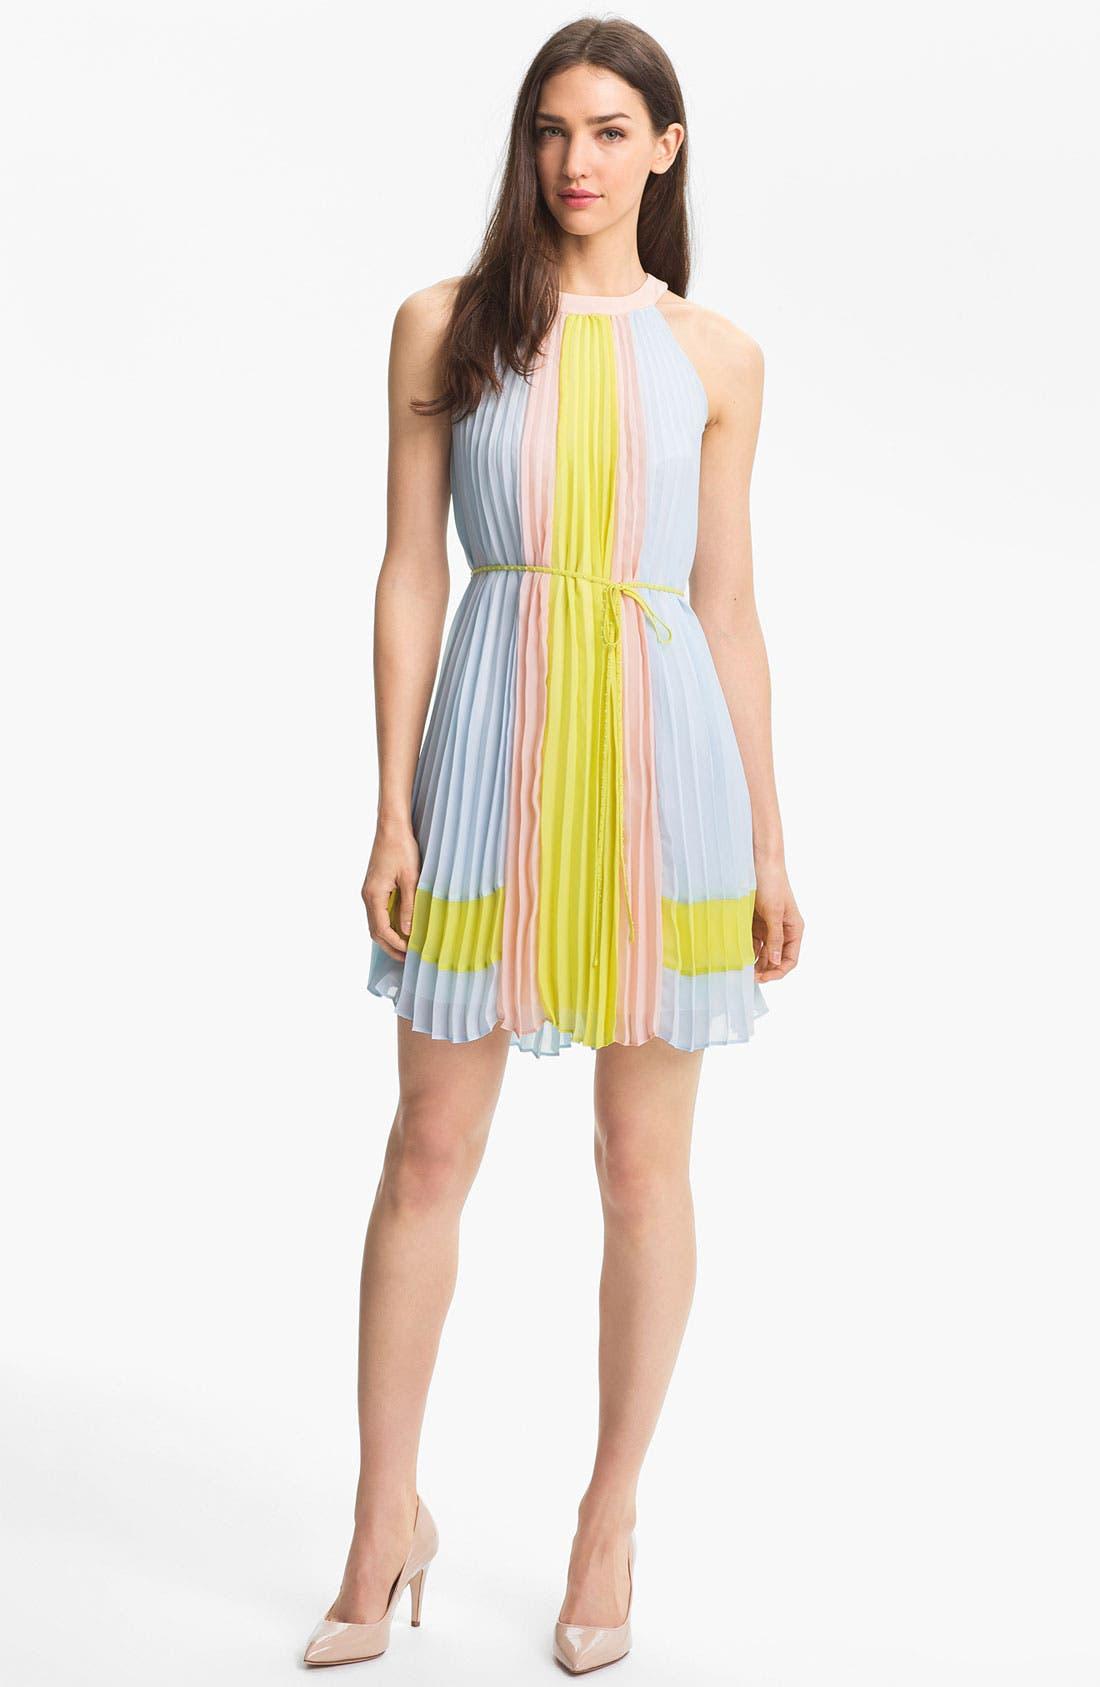 Alternate Image 1 Selected - Ted Baker London Colorblock Dress